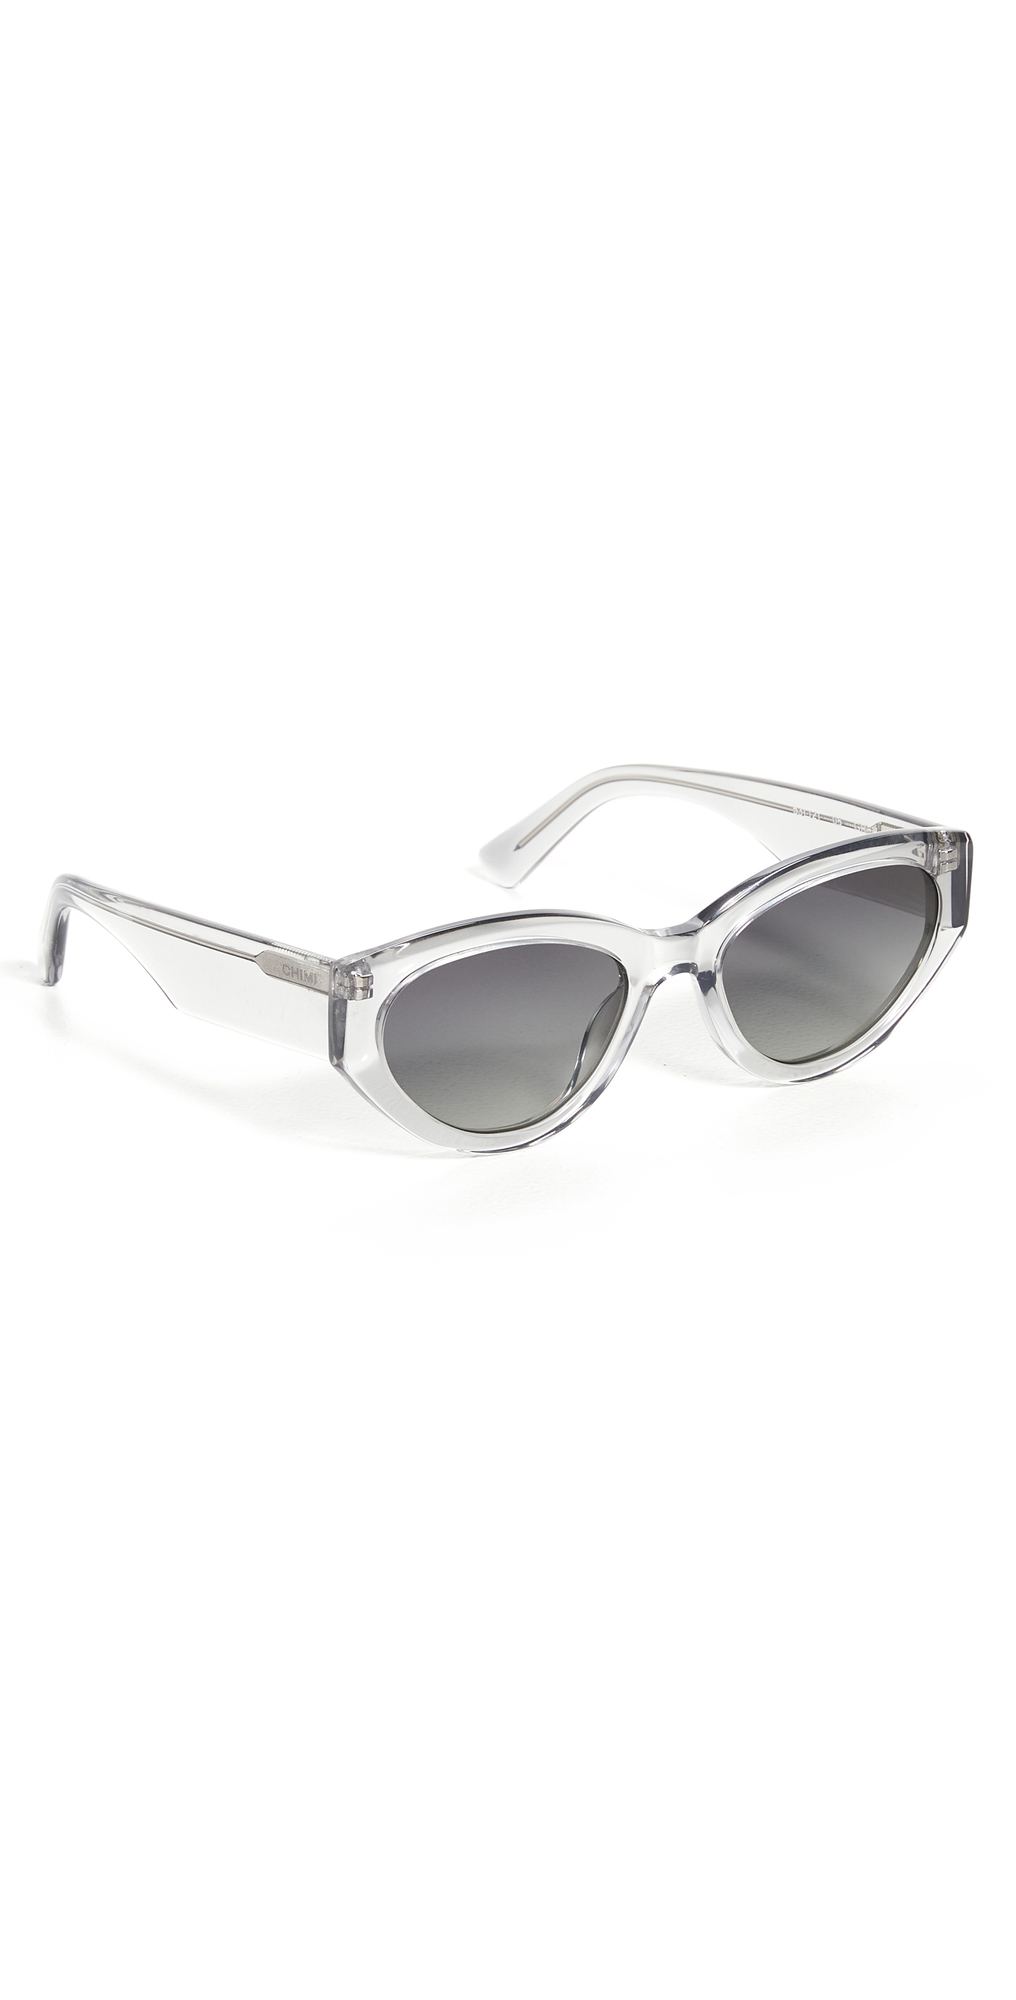 06 Sunglasses